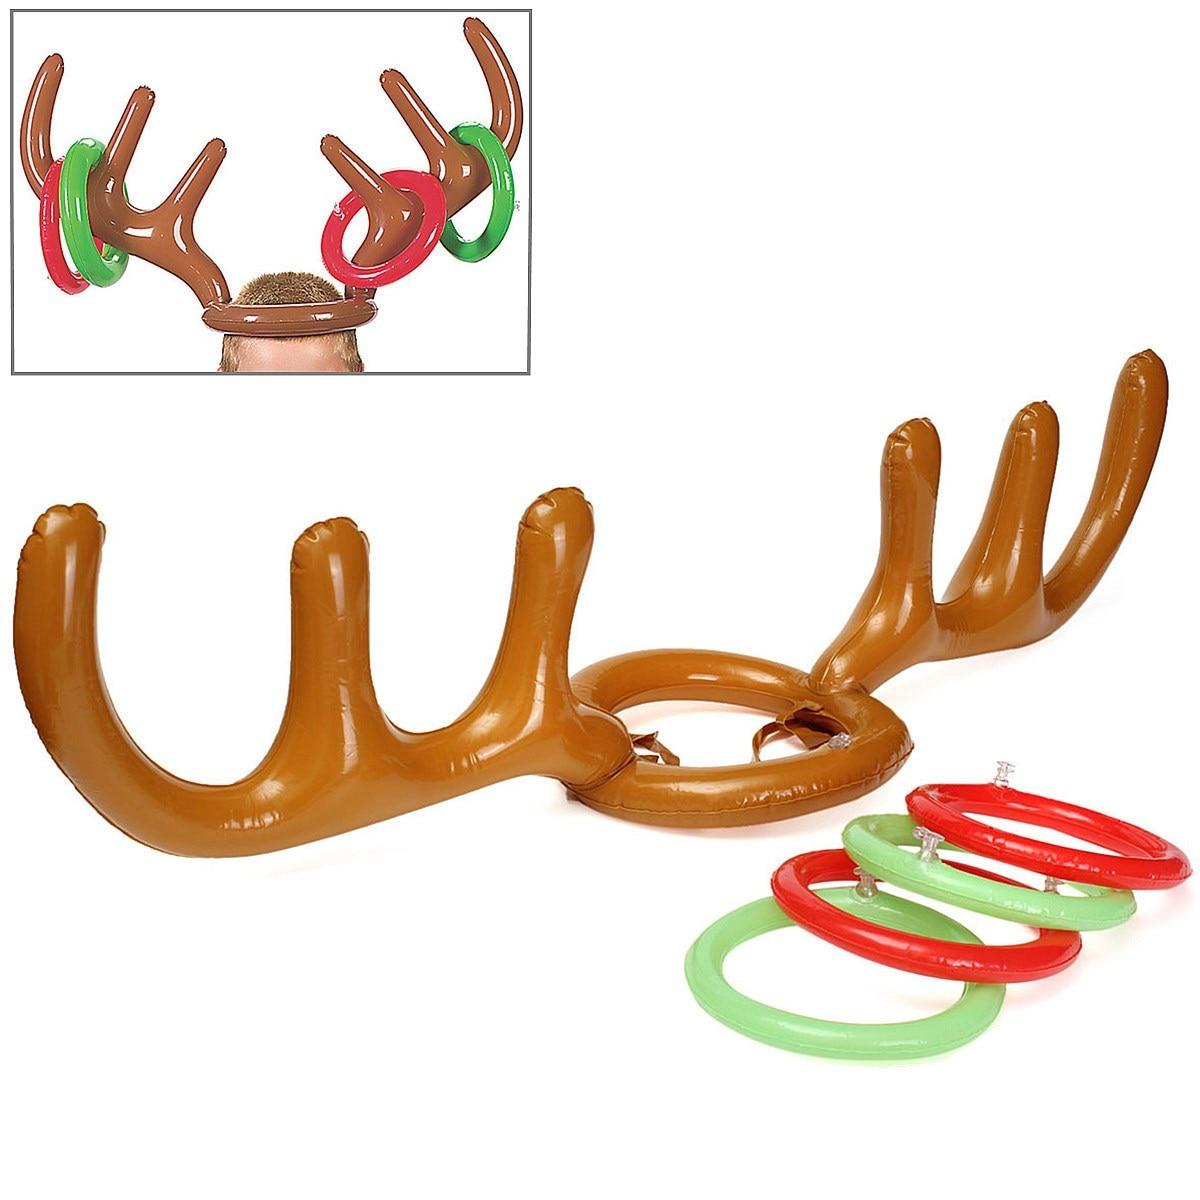 unidades juguetes inflables anillo de tirar del reno de la cornamenta luau tropical playa de